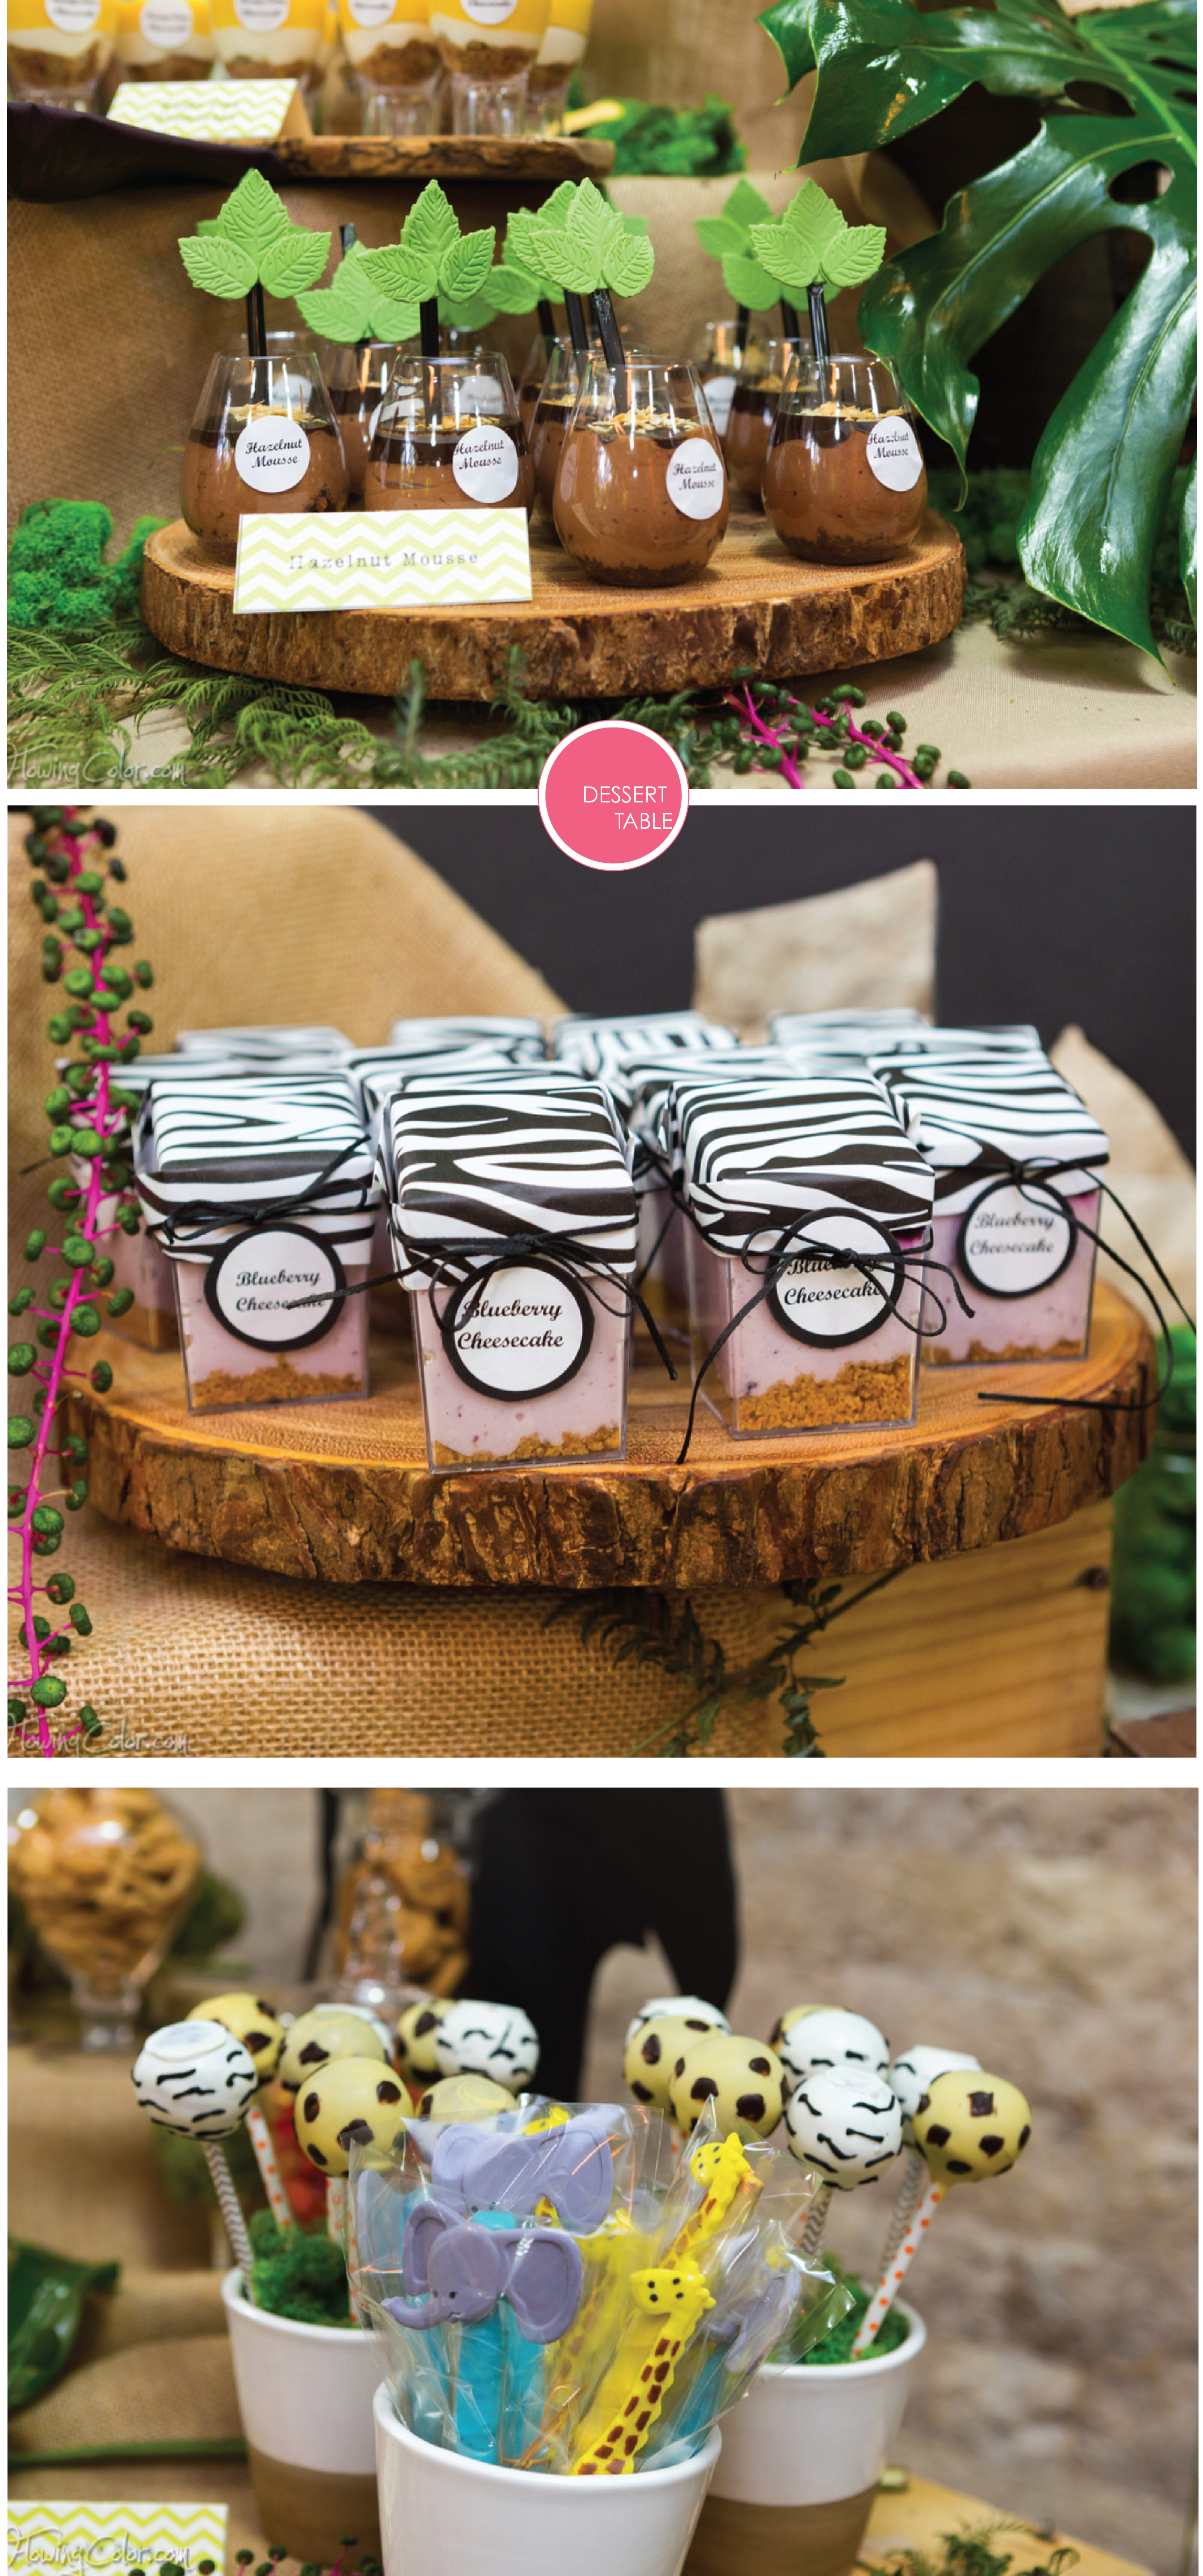 Red Velvet Cake Pops, Chocolate Covered Pretzels, Blueberry Cheesecake, Hazelnut Mousse